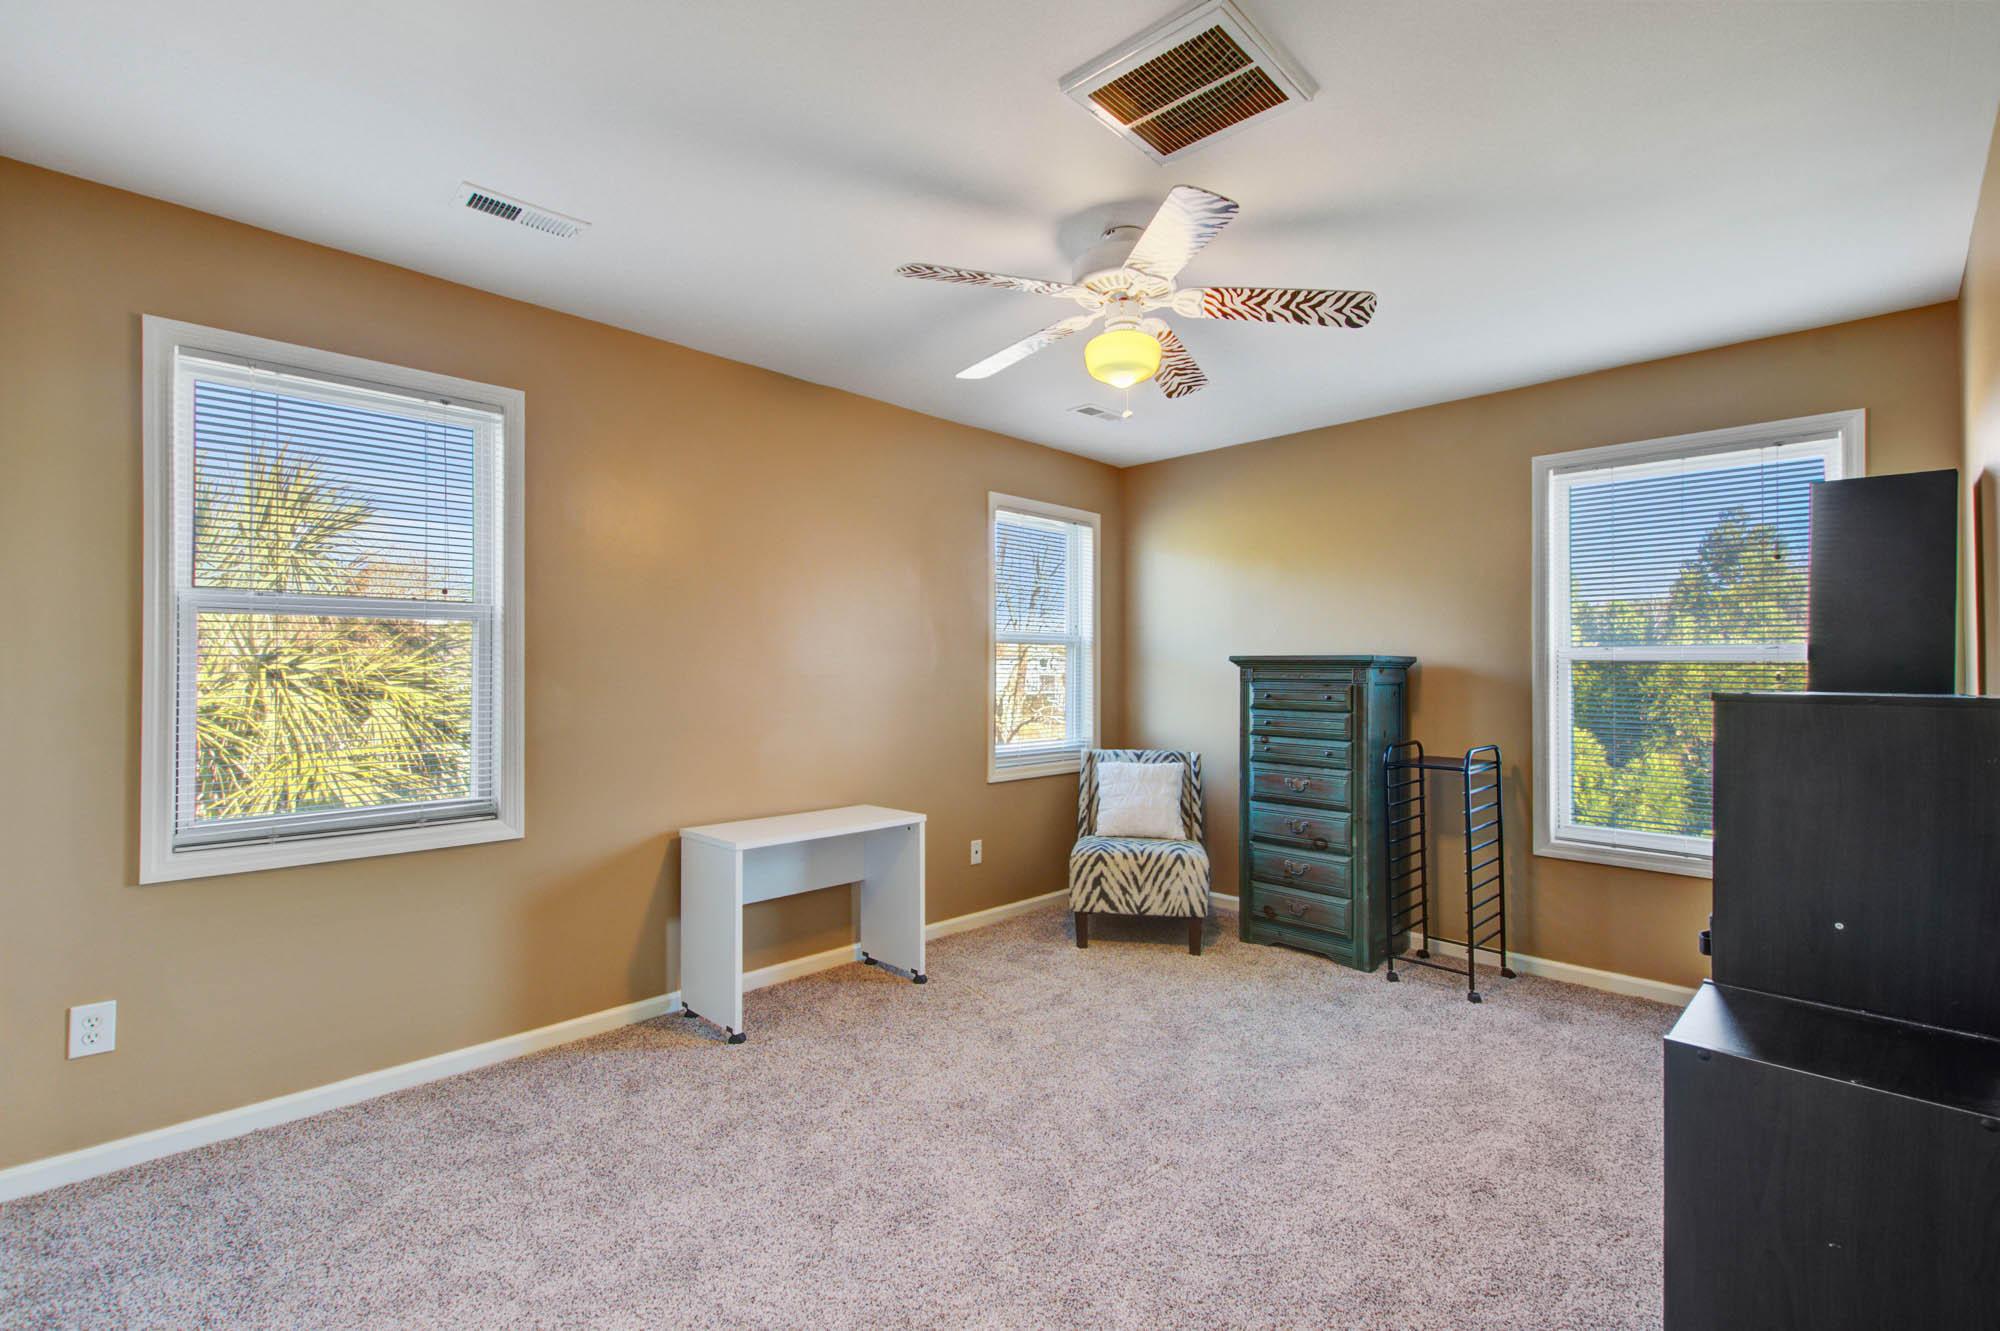 St Thomas Point Homes For Sale - 307 Jamesbury, Charleston, SC - 14